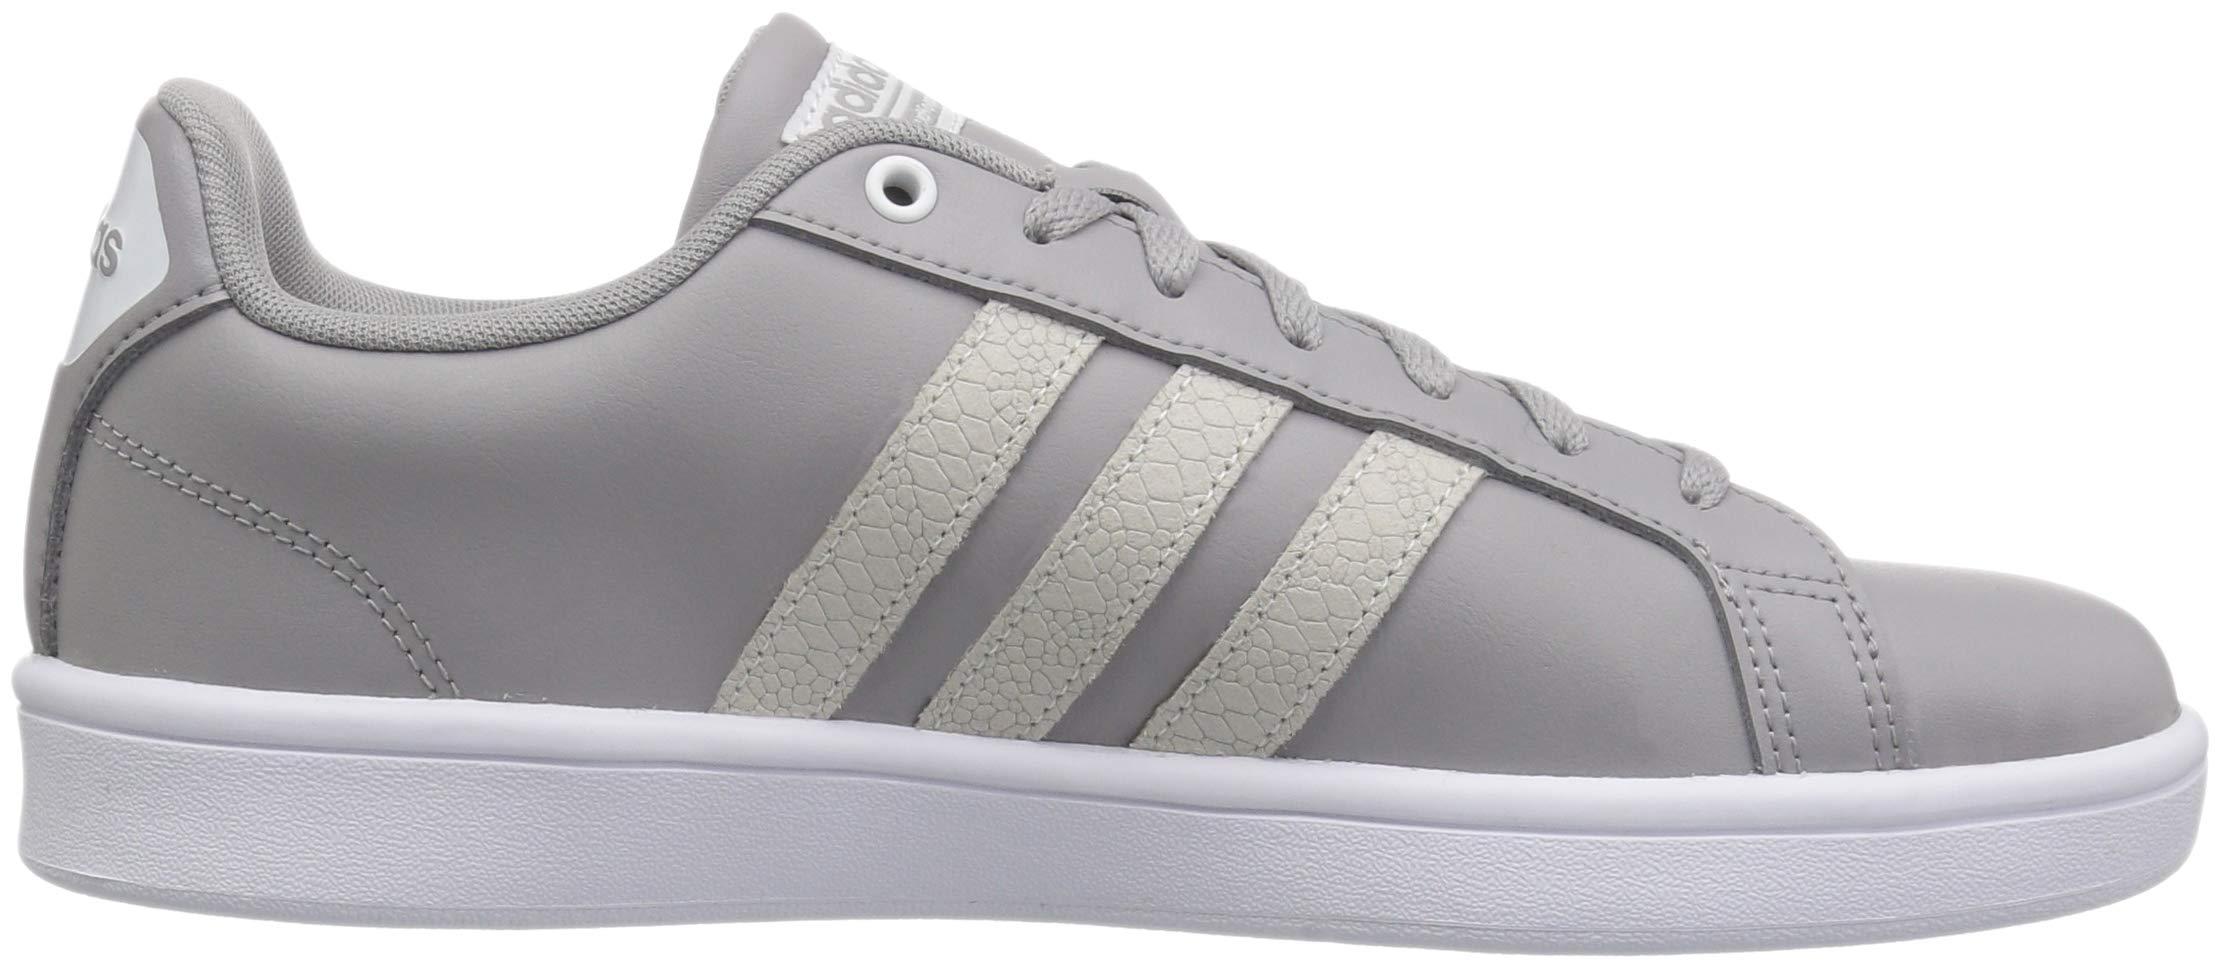 adidas Women's Cloudfoam Advantage Cl Sneaker, Light Granite/White/Light Granite, 10 M US